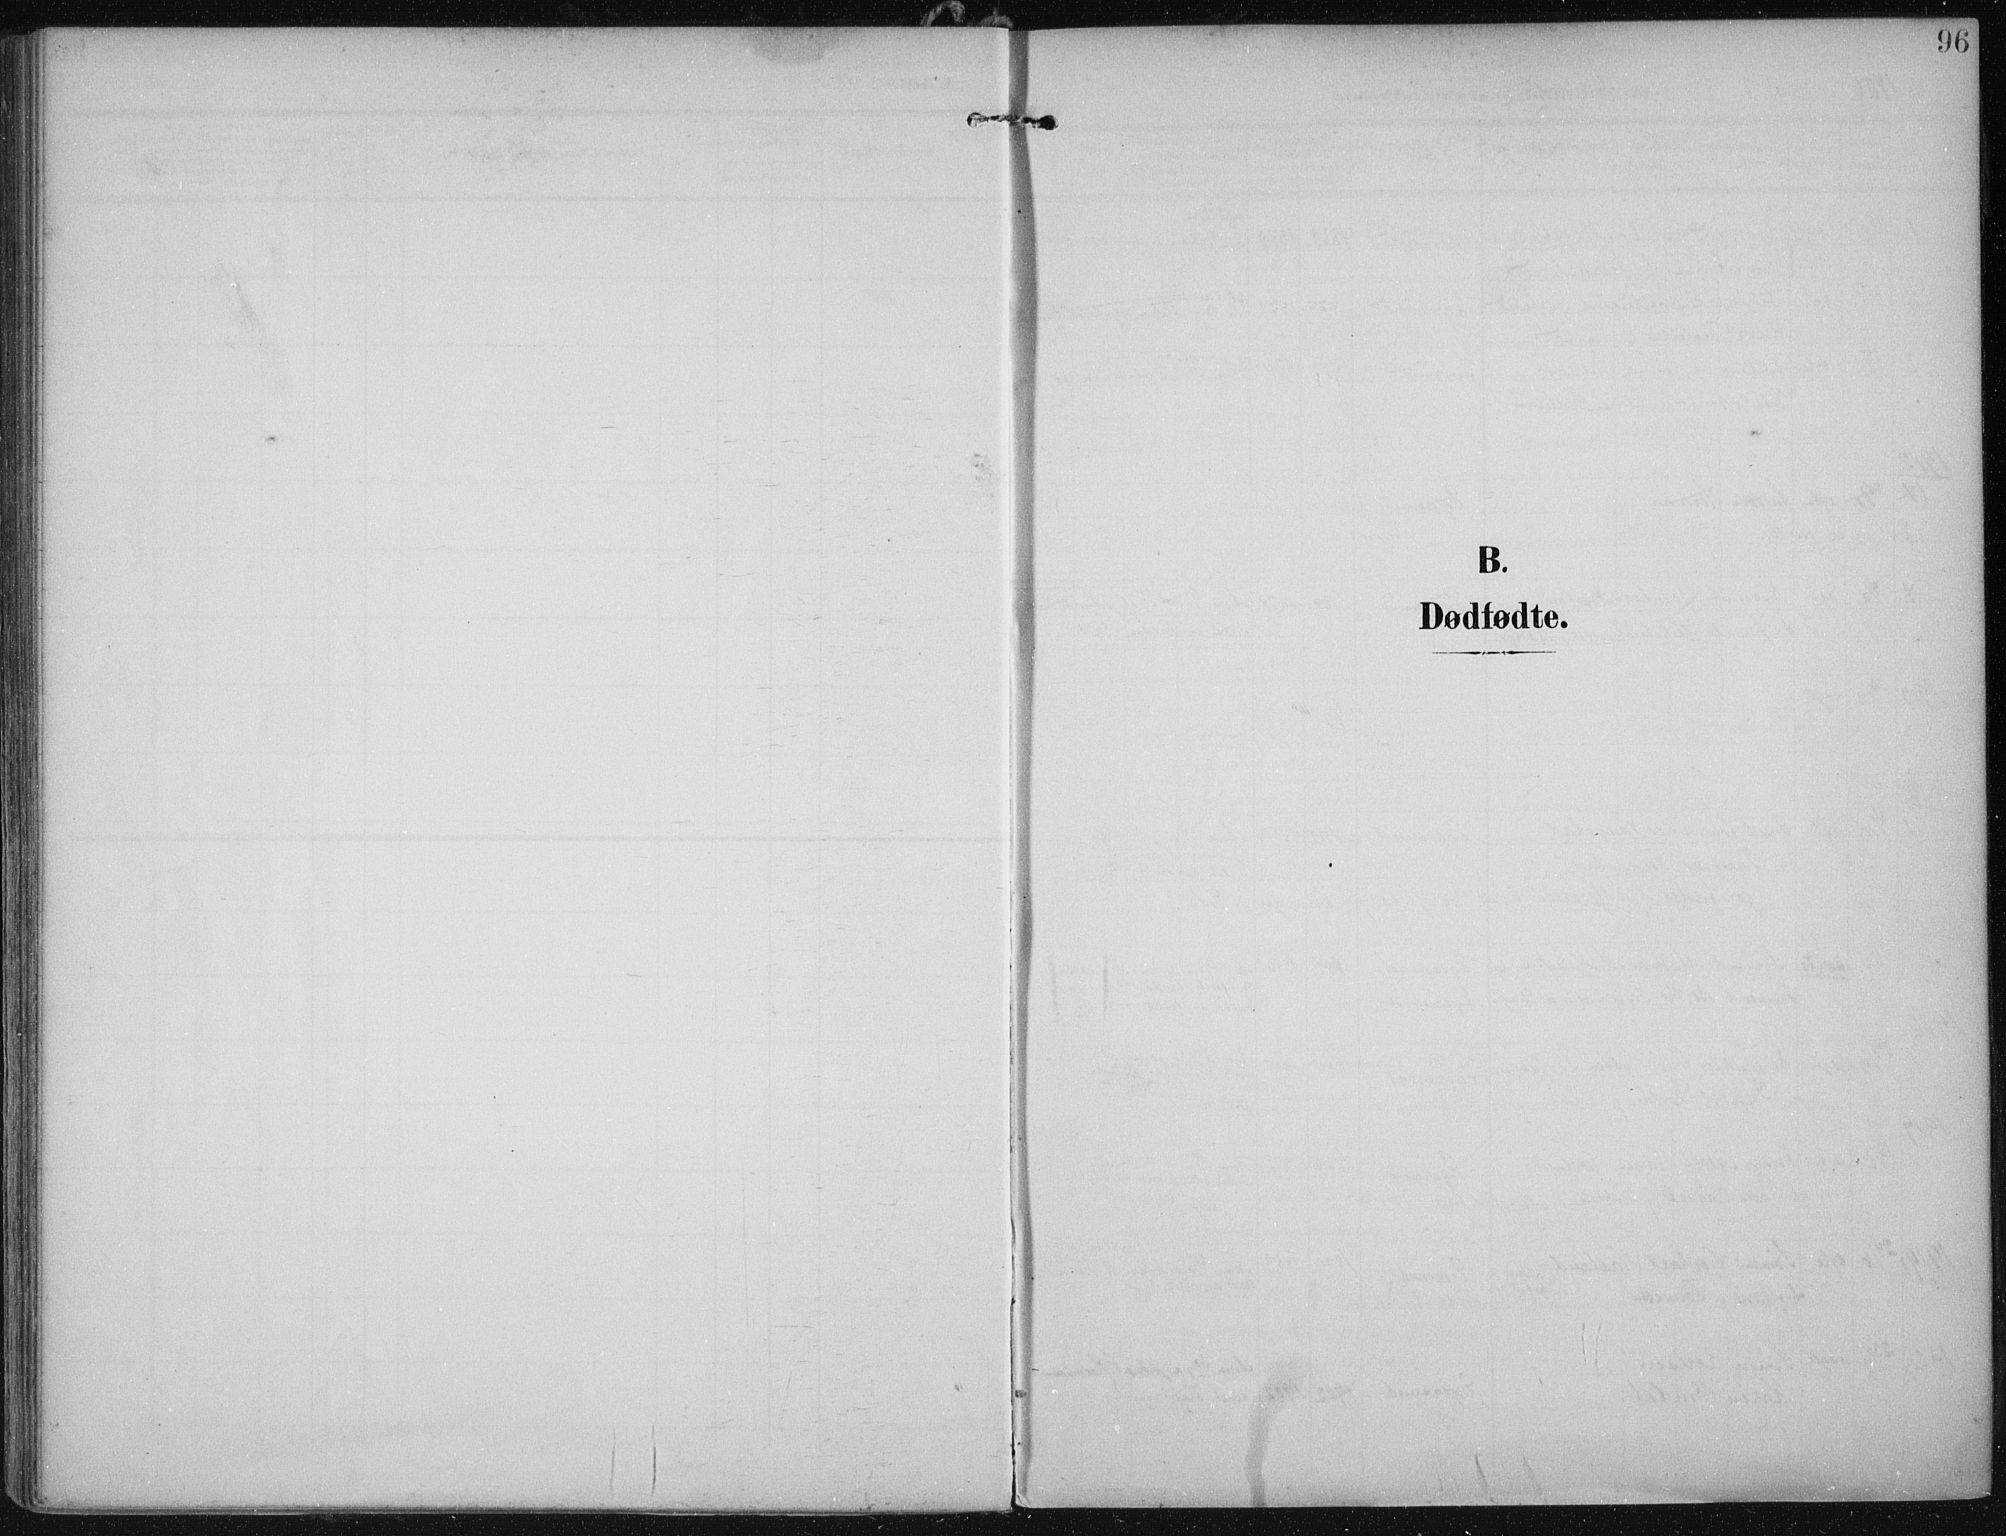 SAST, Egersund sokneprestkontor, Ministerialbok nr. A 21, 1905-1928, s. 96